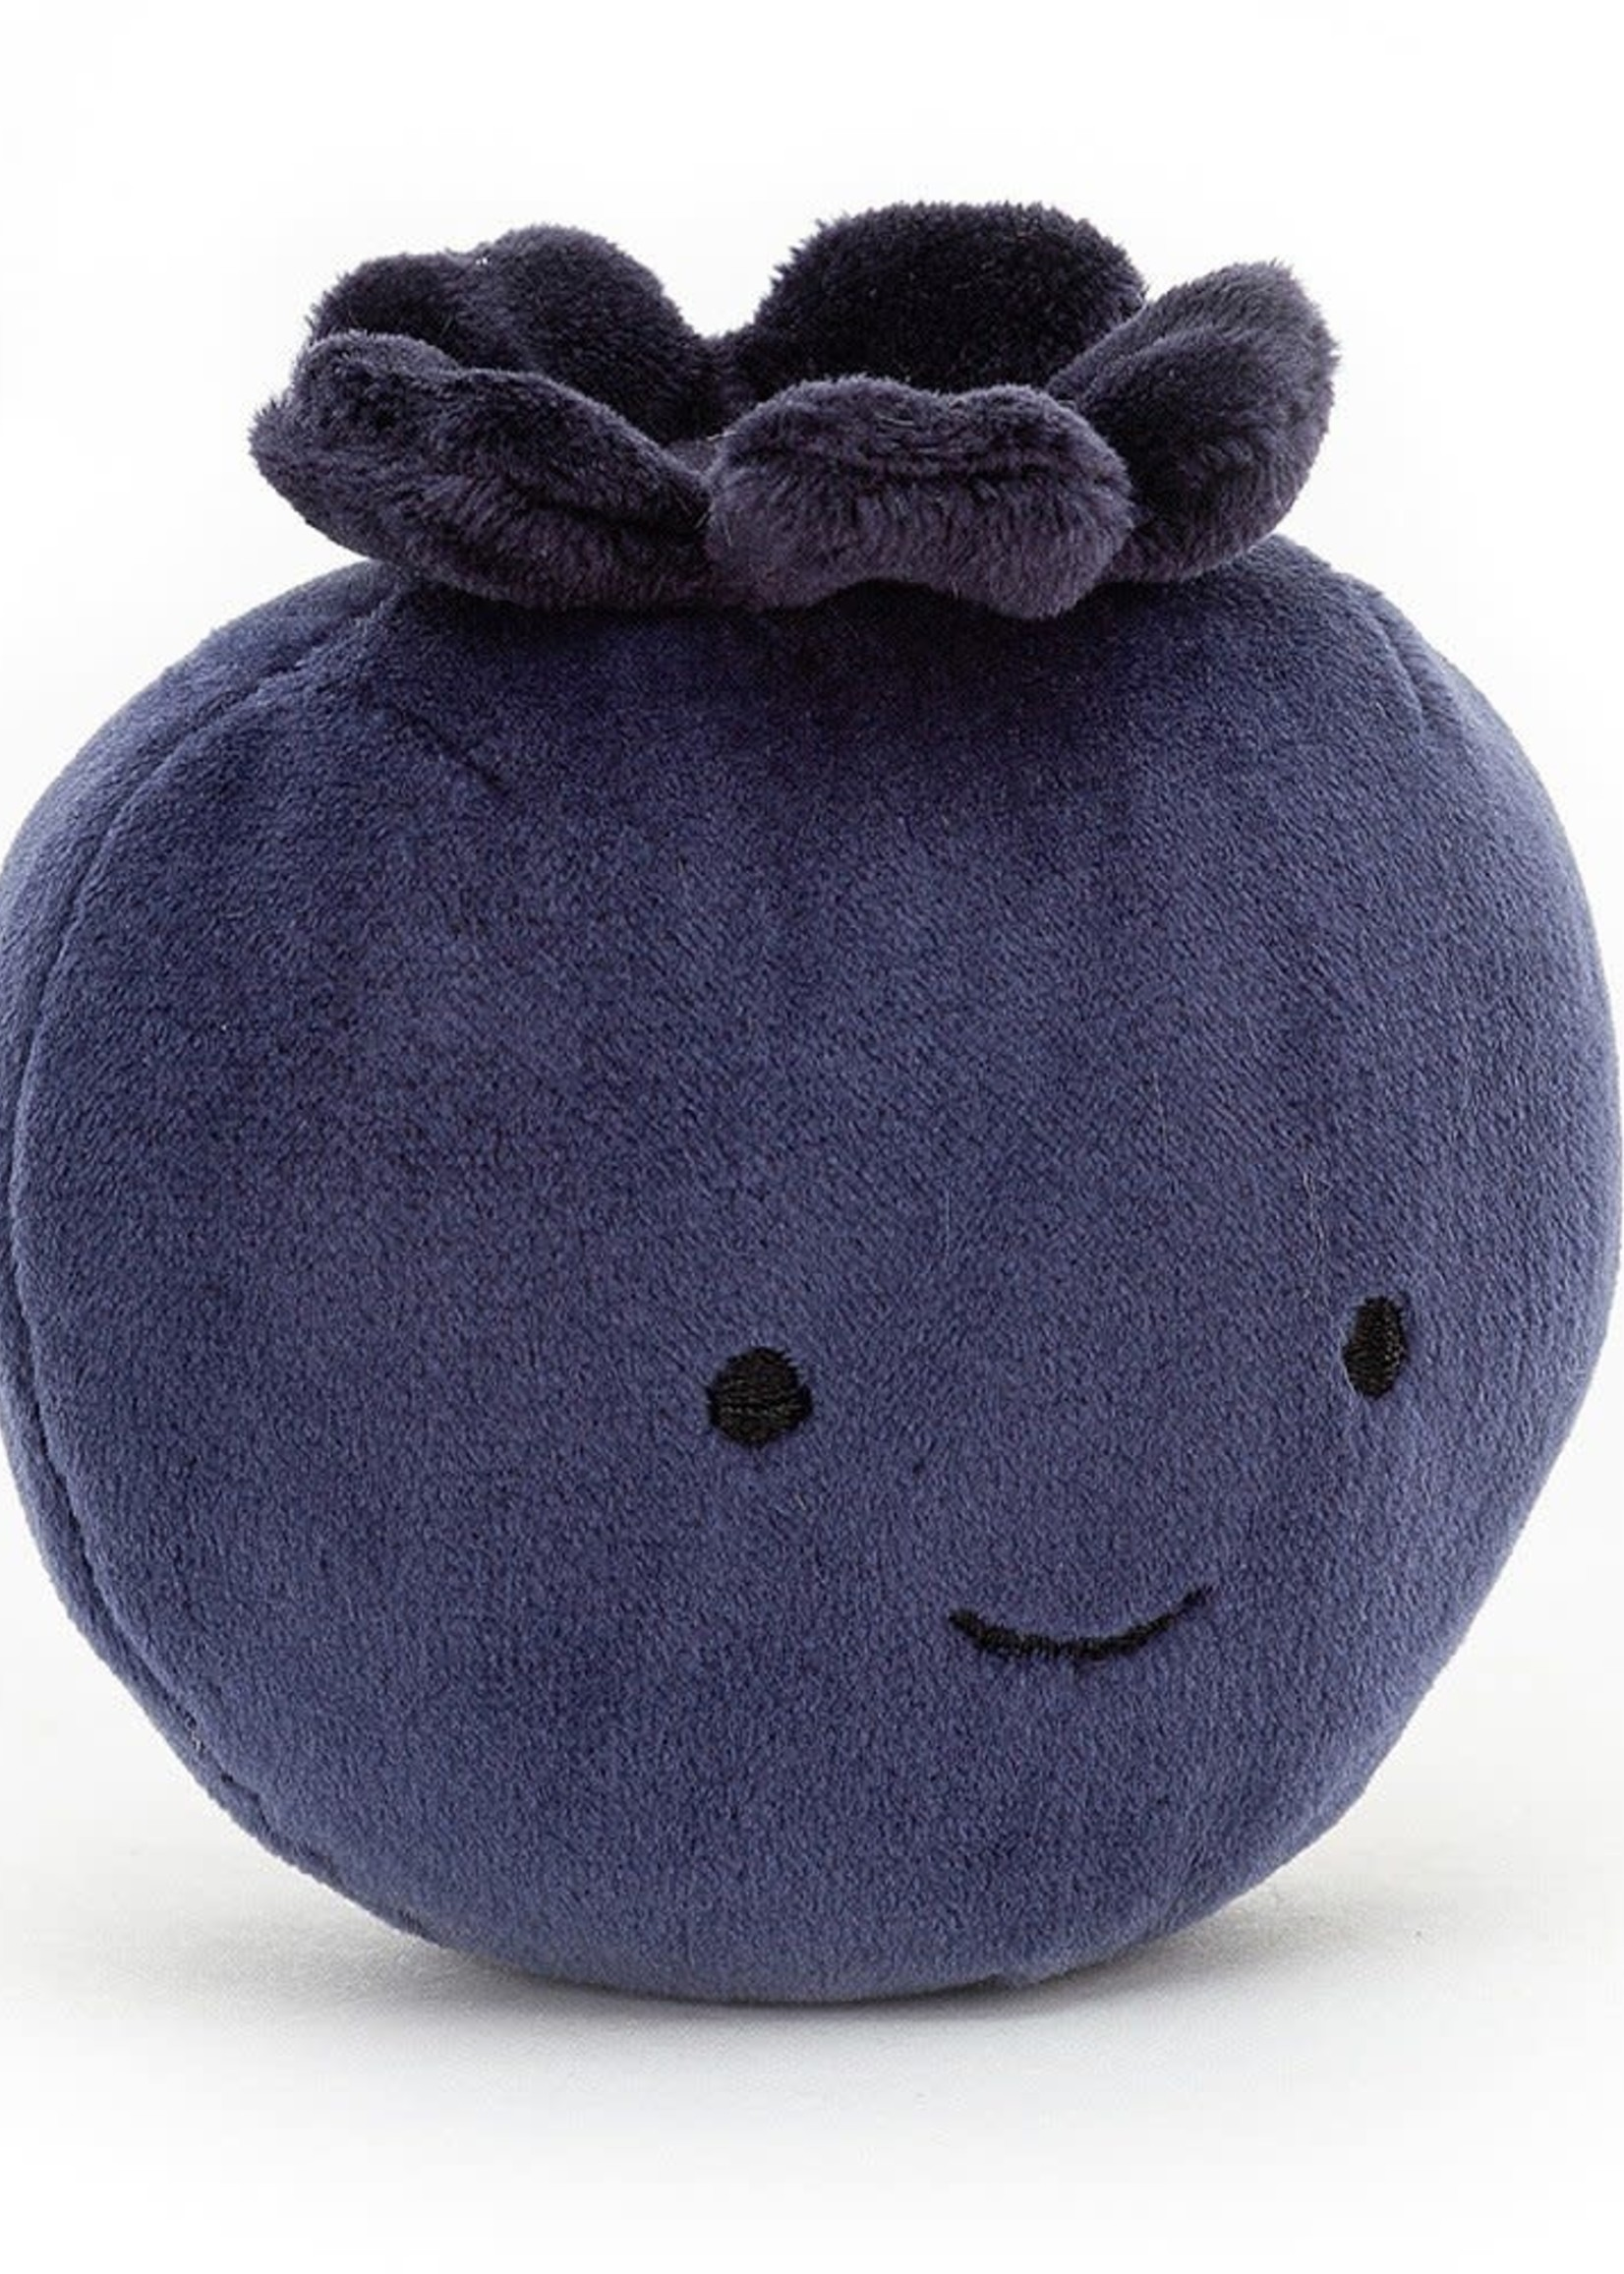 Jellycat JC Fabulous Blueberry